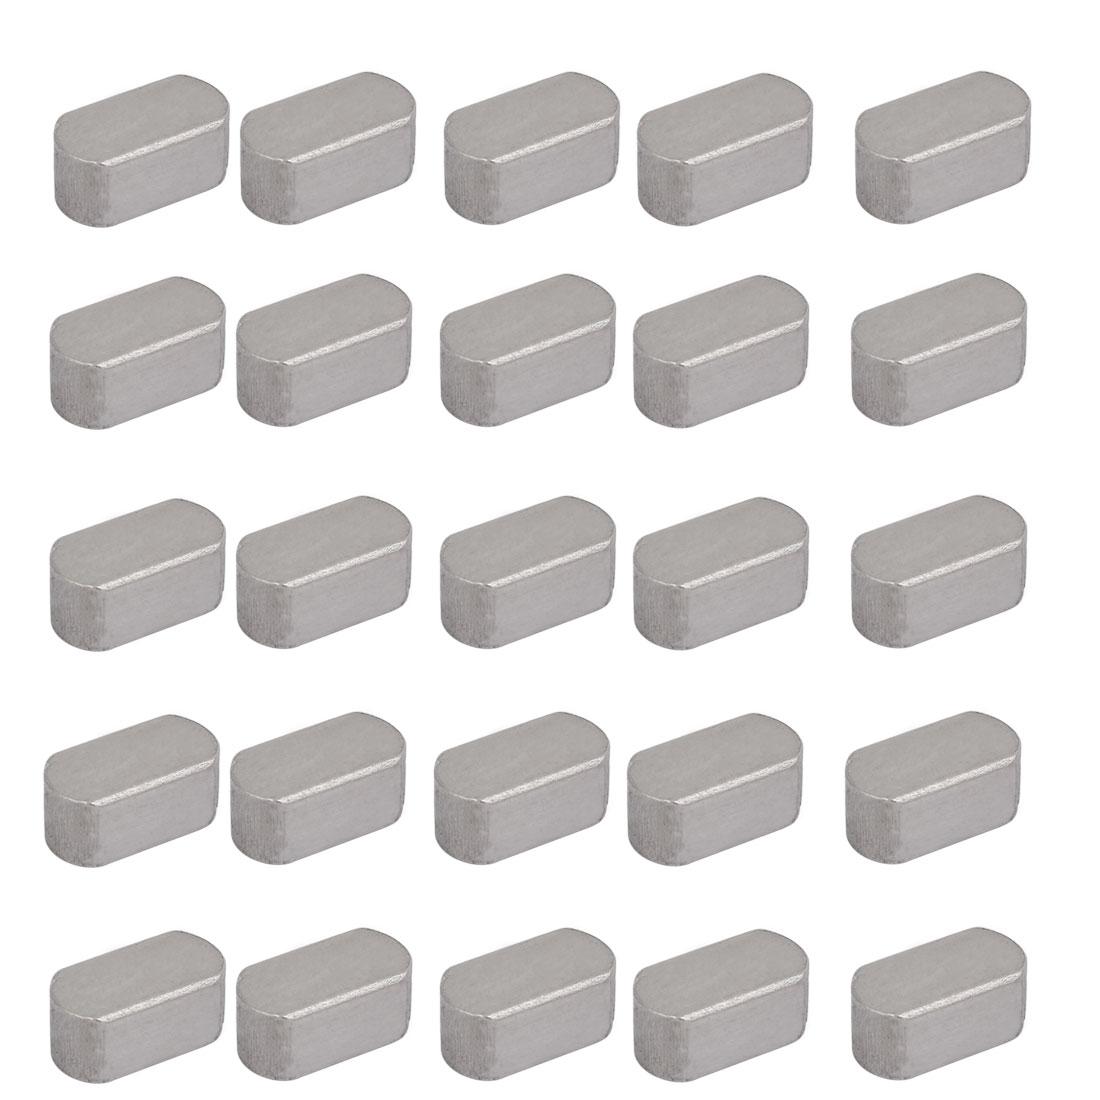 18mmx10mmx8mm Carbon Steel Key Stock To Lock Pulleys 25pcs